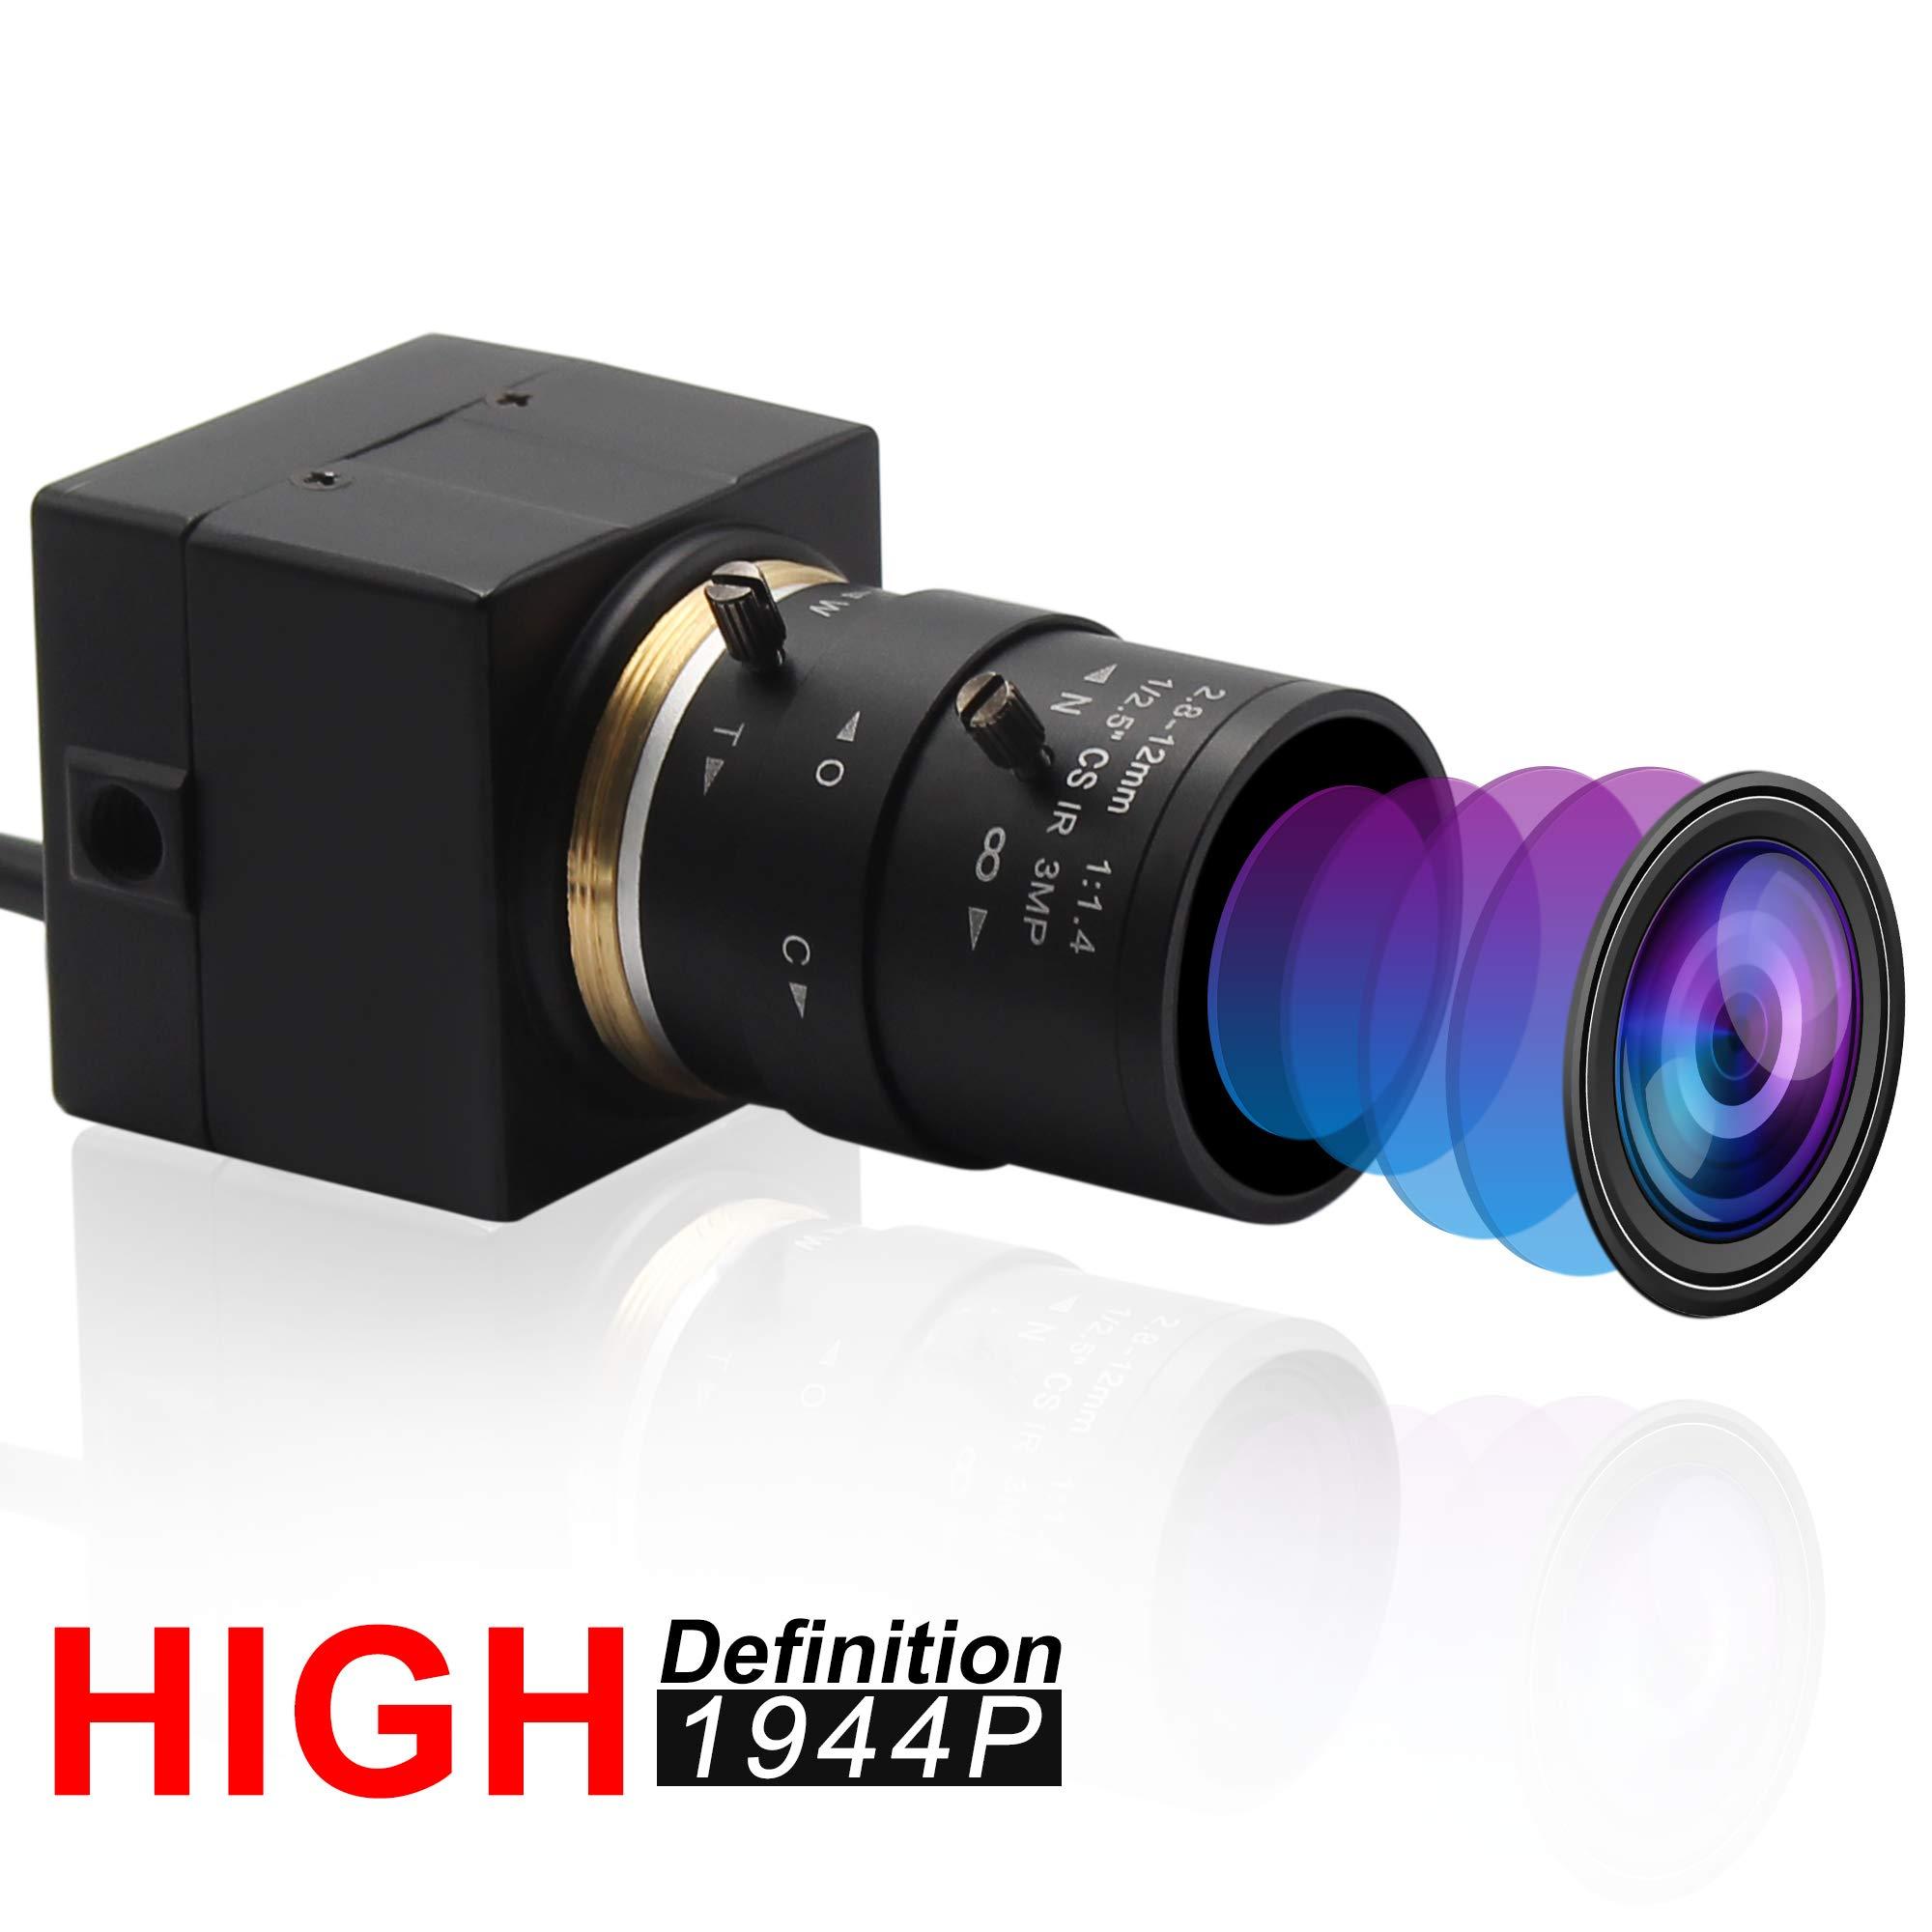 Varifocal Lens USB Webcam Mini Camera with Case 5 Megapixel 2.8-12mm Aptina MI5100 USB with Cameras,High Definition 2592X1944@15fps Webcam,USB2.0 Computer Camera with Box Support Most OS/UVC Protocol